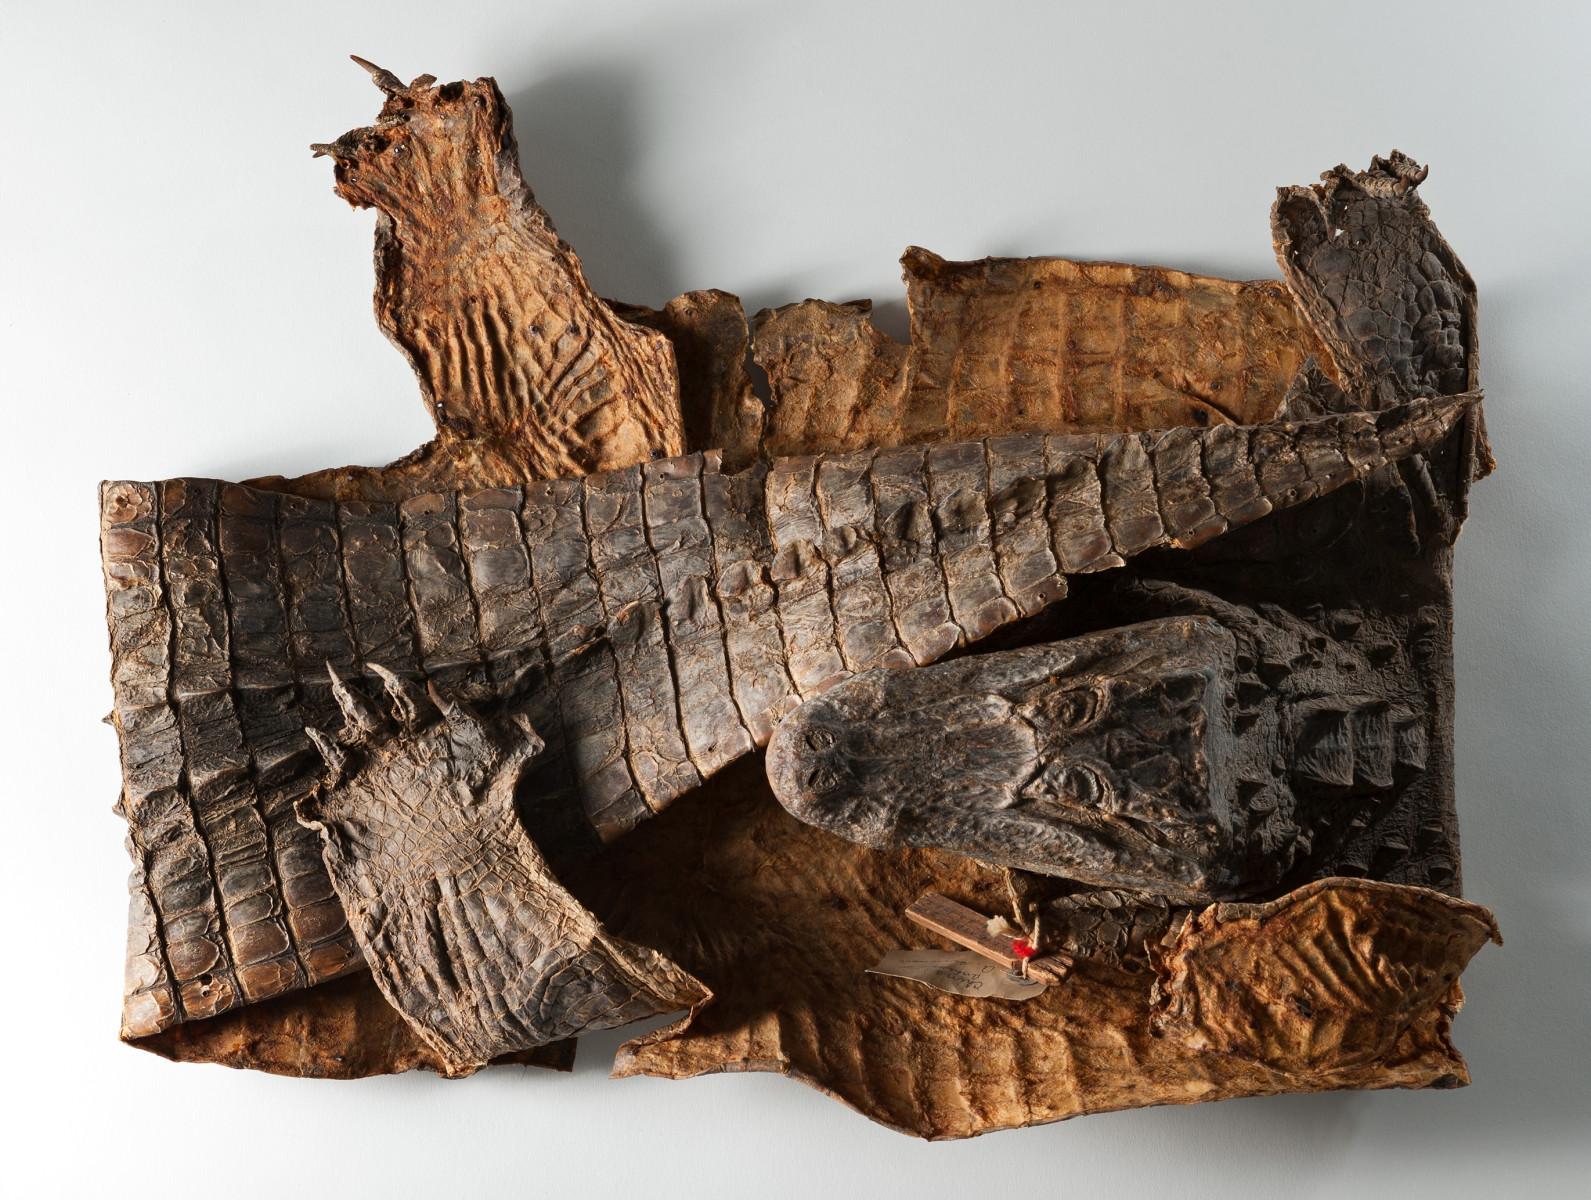 Chinese Alligator reptile Alligator sinensis - Extinction